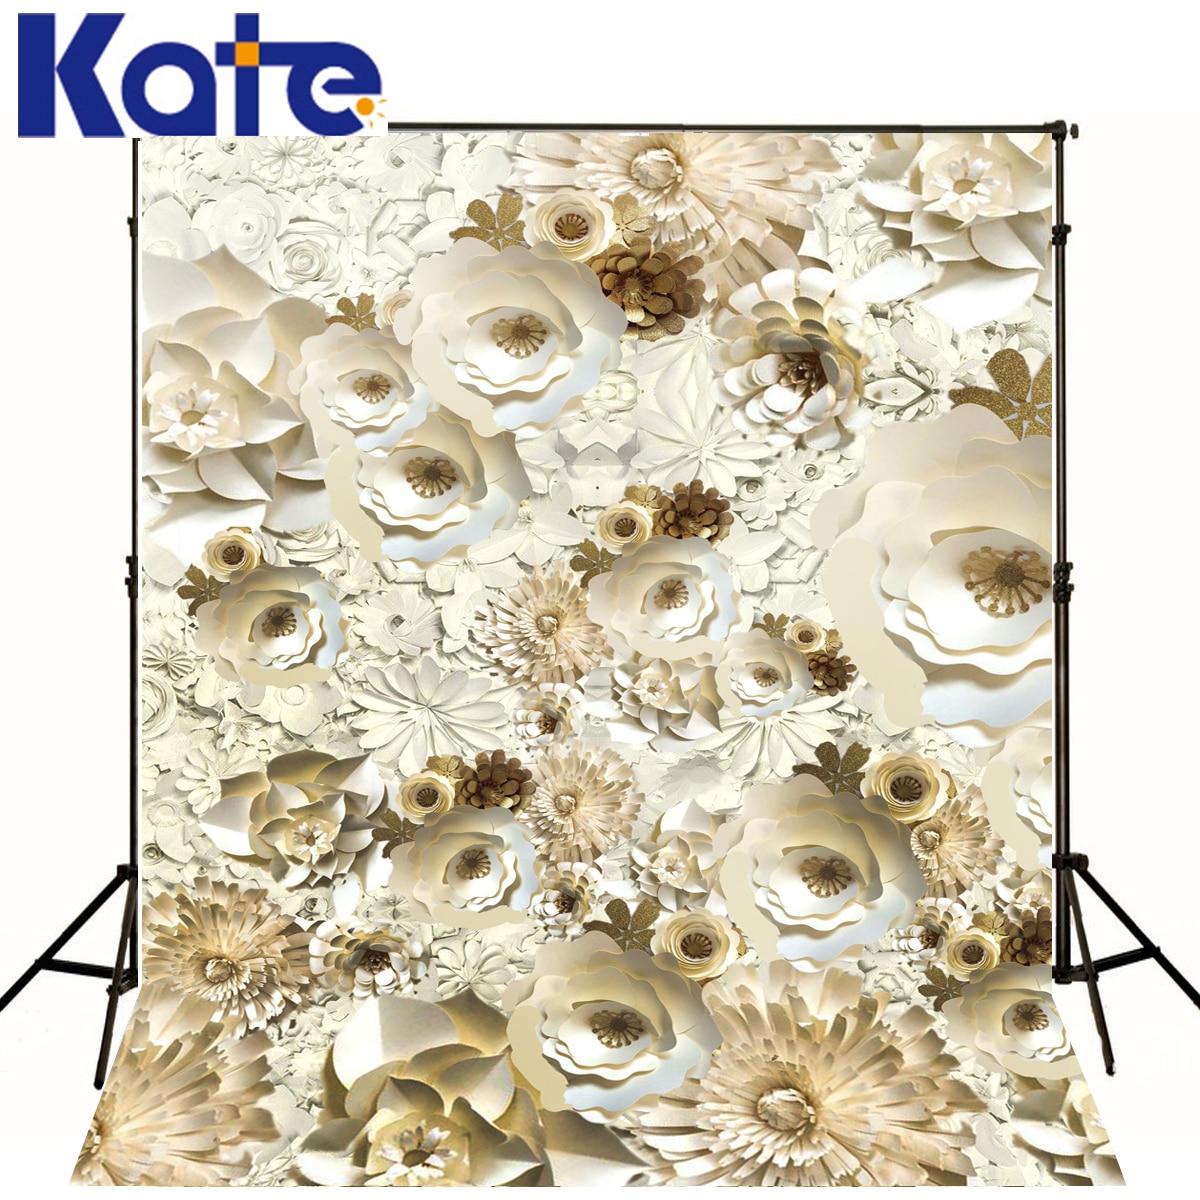 Kate Vintage Wedding Artificial-flowers Backdrops White Paper Flower Backdrop Newborn Background сумка kate spade new york wkru2816 kate spade hanna